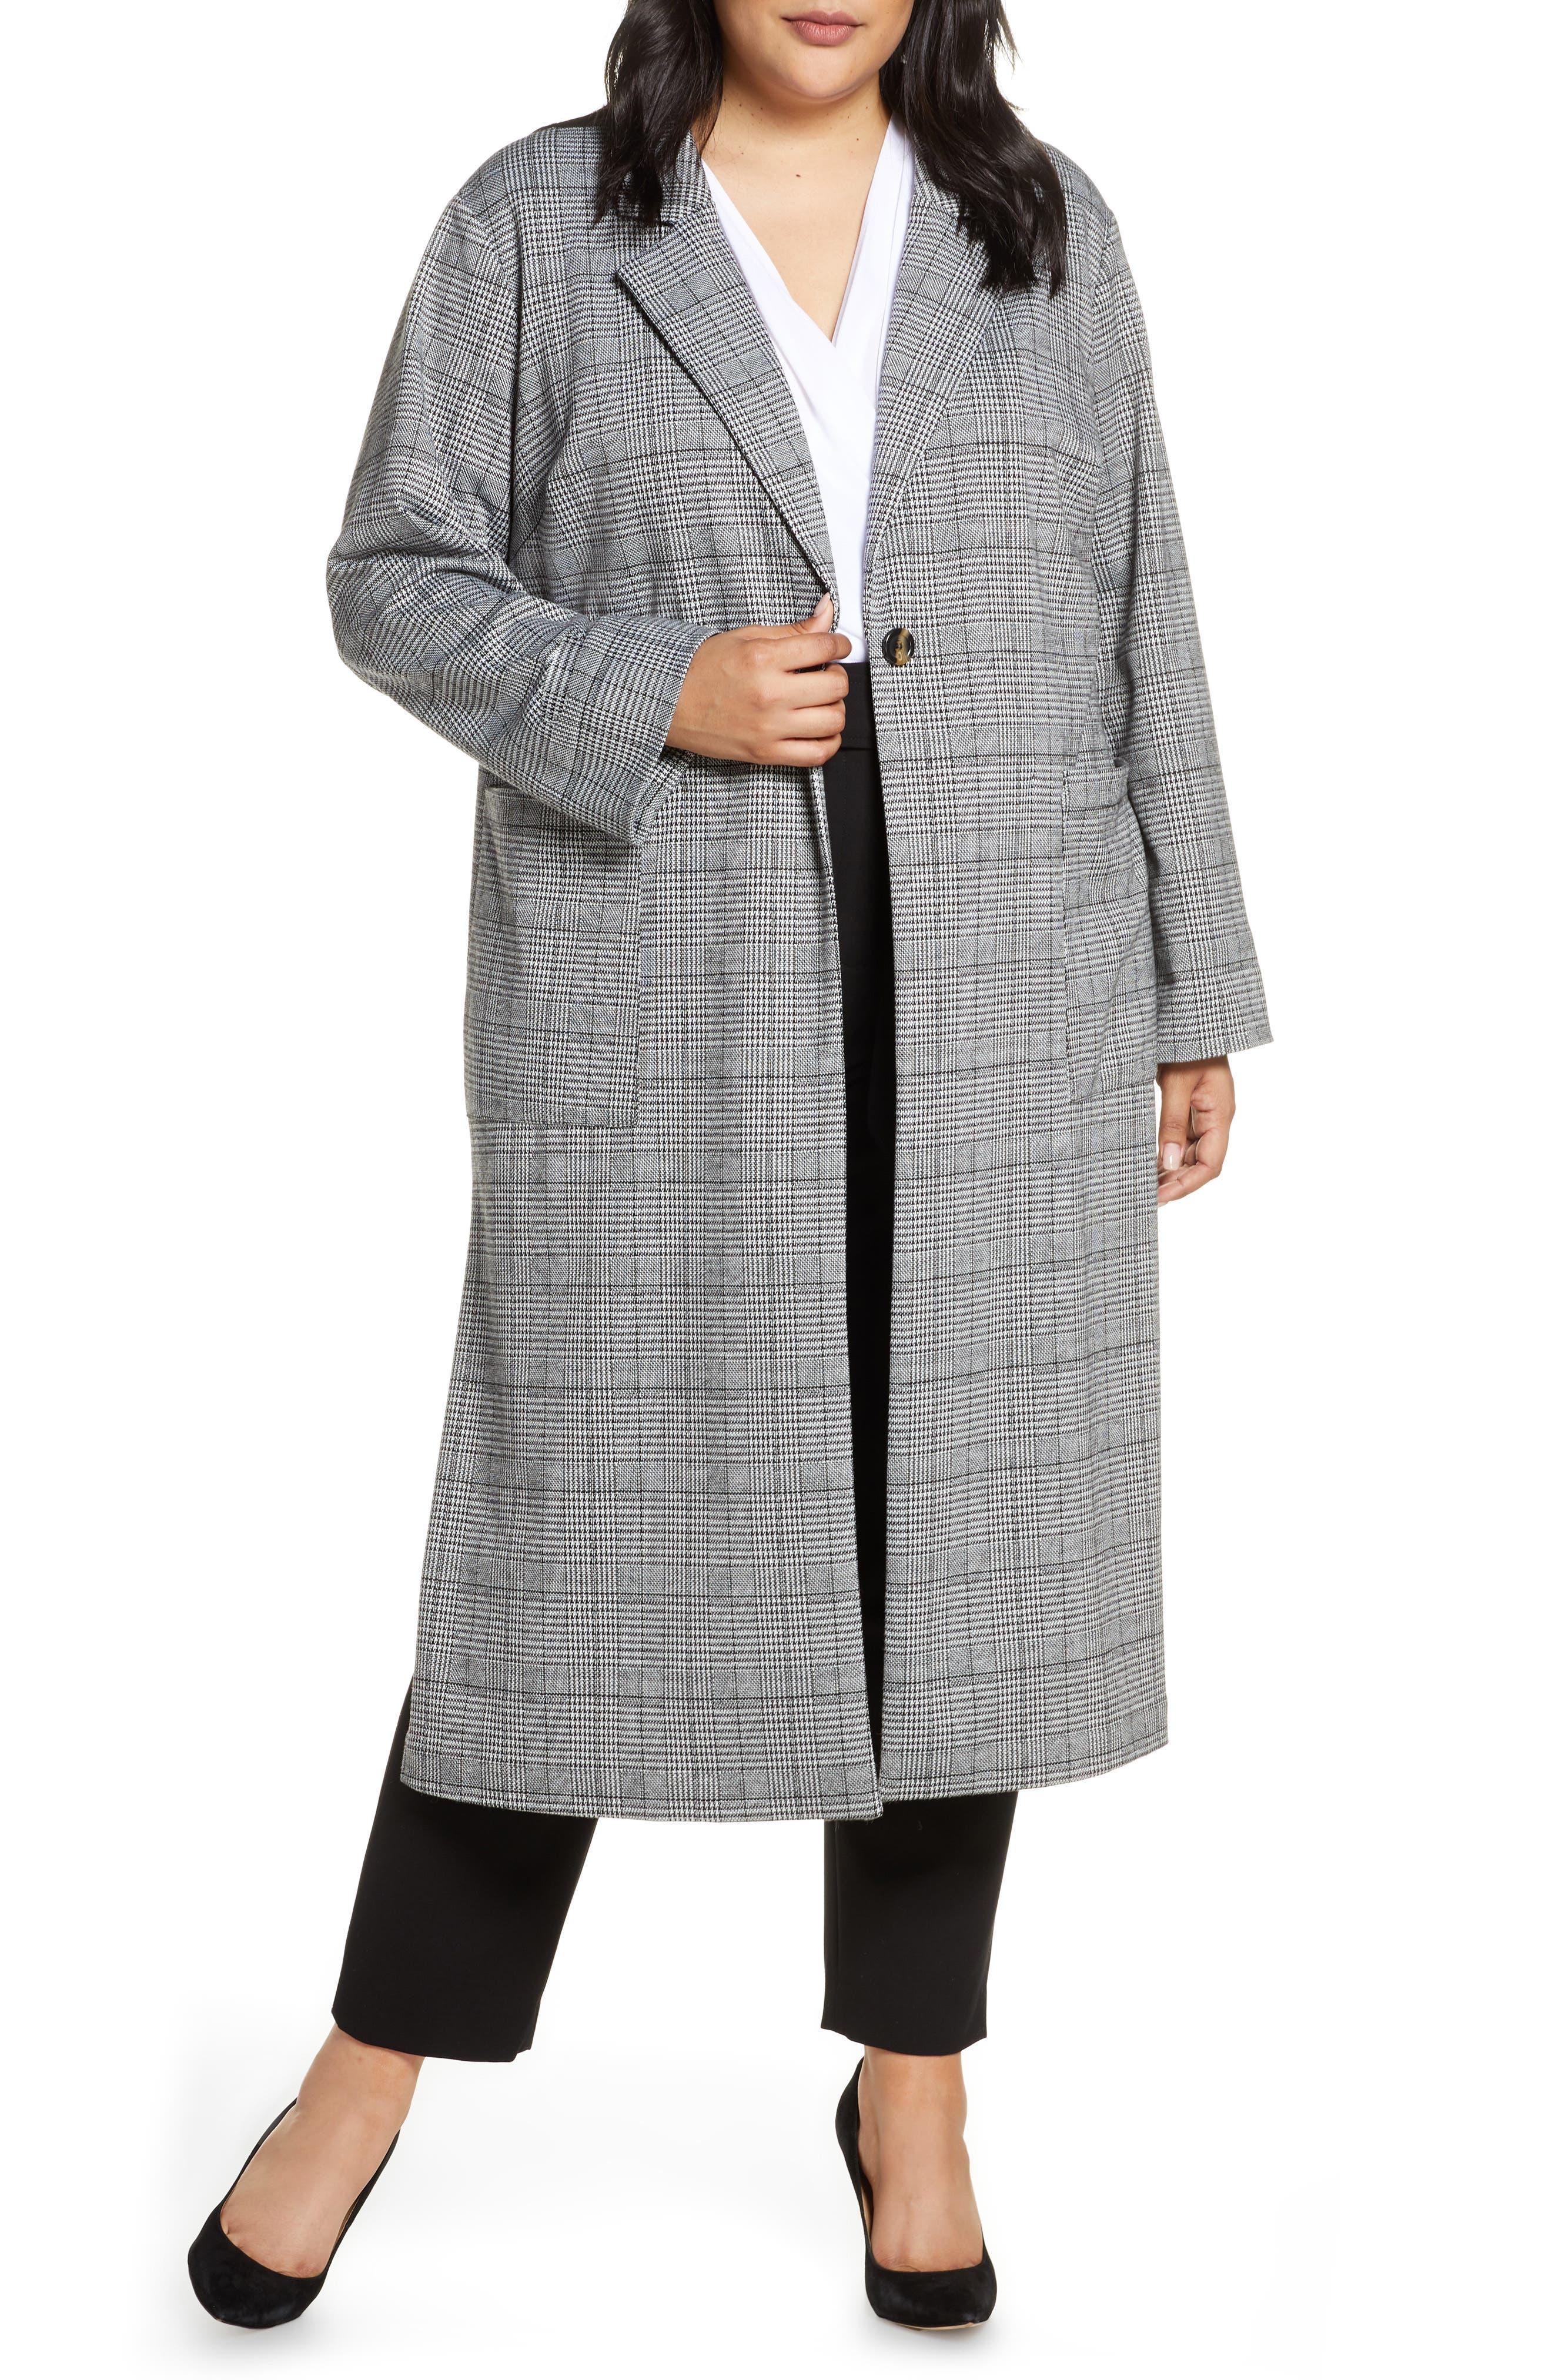 Vintage Coats & Jackets | Retro Coats and Jackets Plus Size Womens Sanctuary Timeless Plaid Duster Jacket $169.00 AT vintagedancer.com